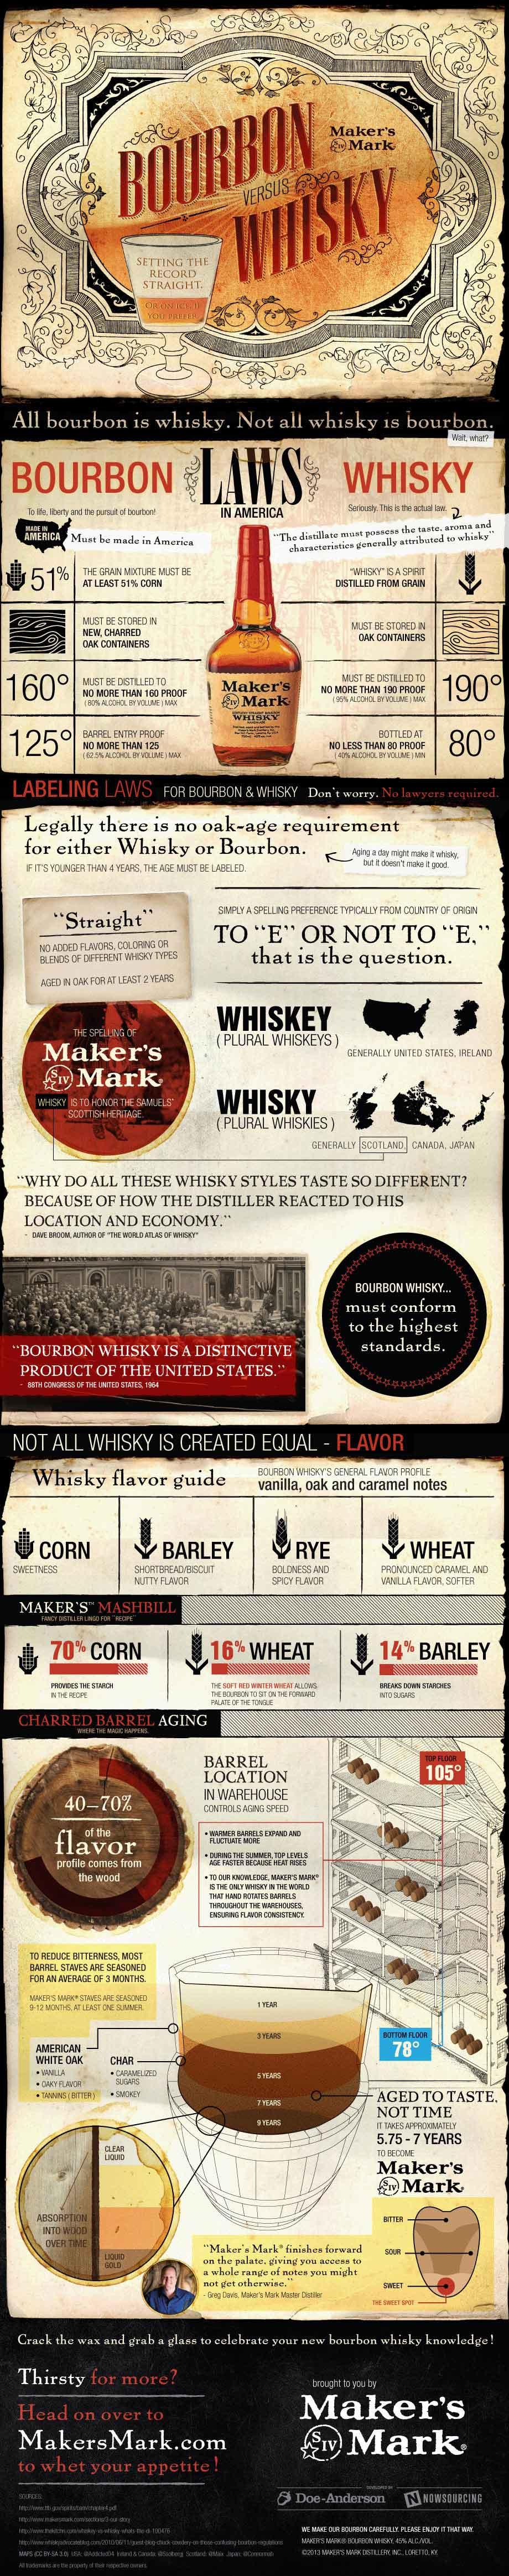 Bourbon Versus Whisky [INFOGRAPHIC] #bourbon #whisky